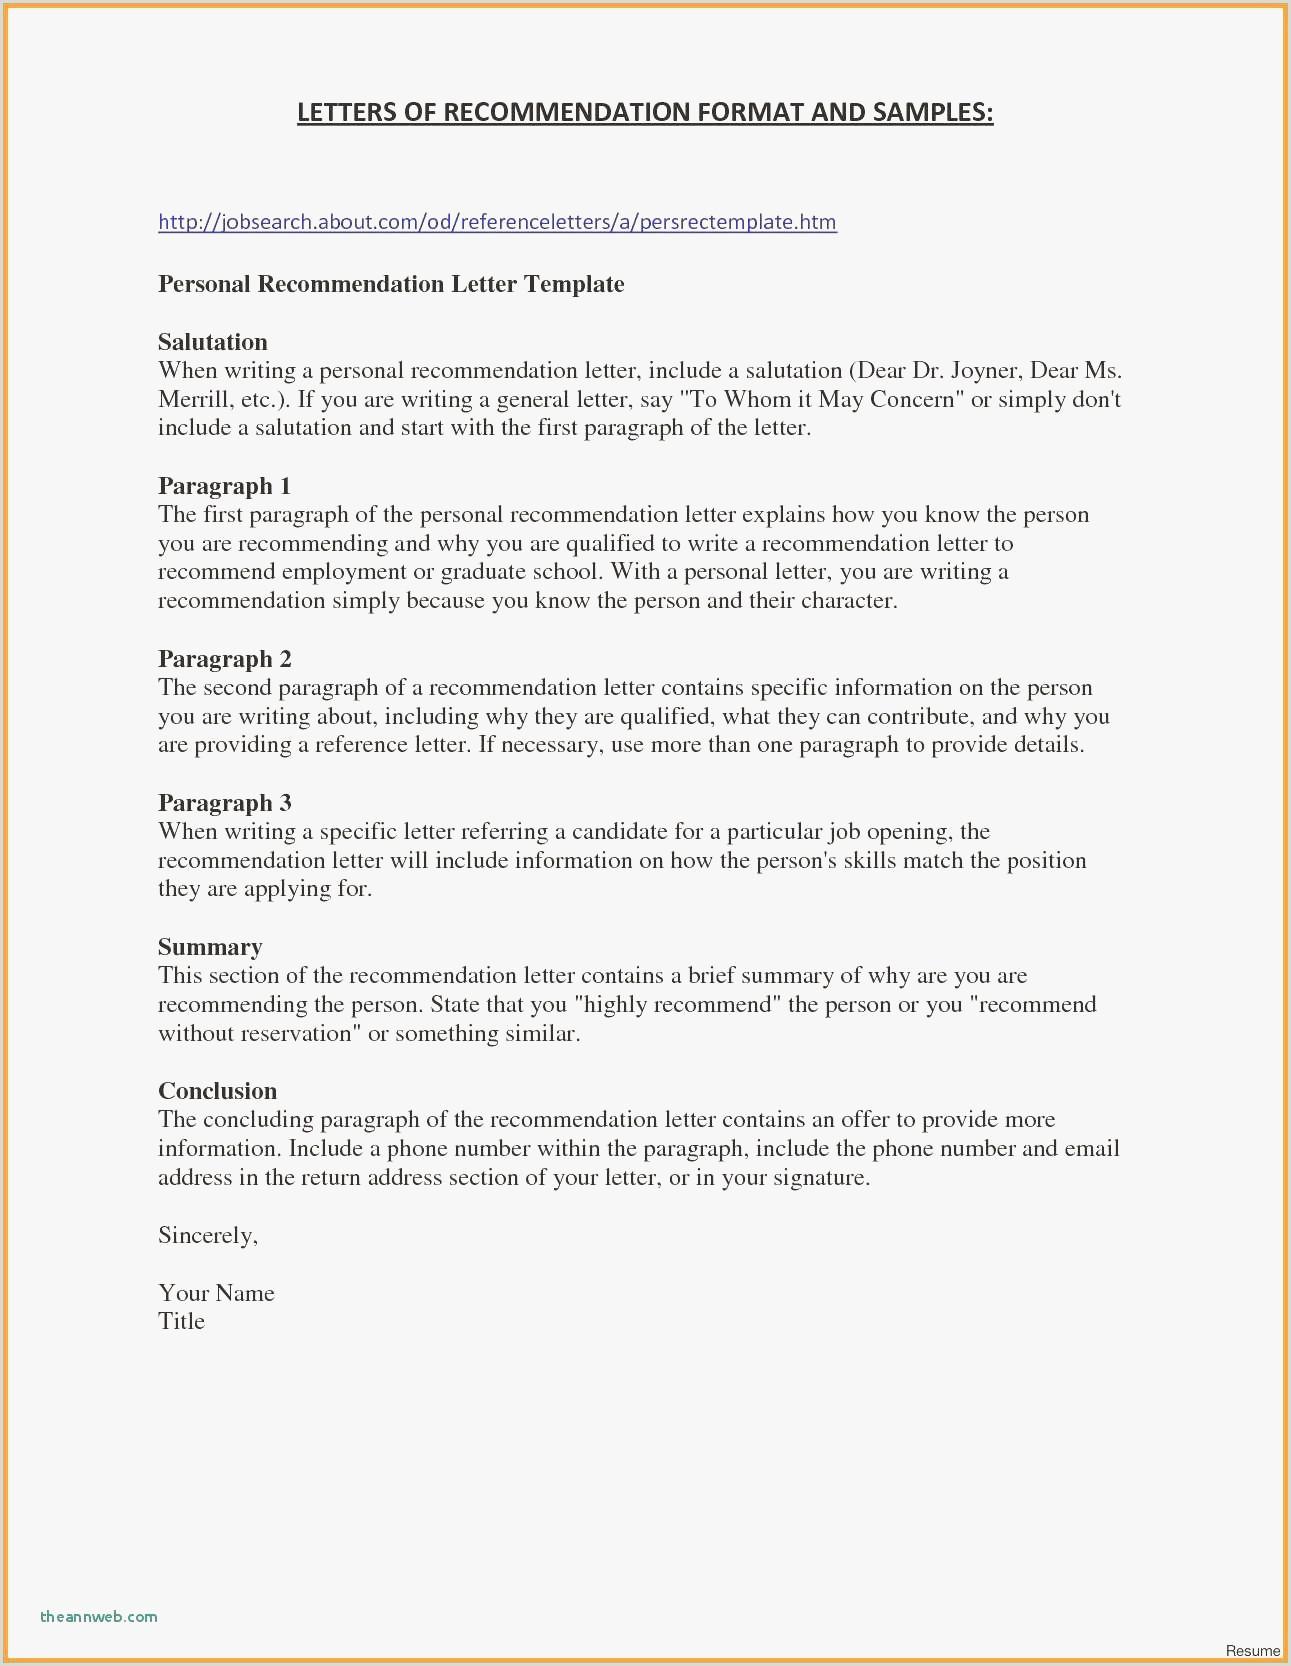 Standard Cv format for Hotel Job 12 Cover Letter for A Hotel Job